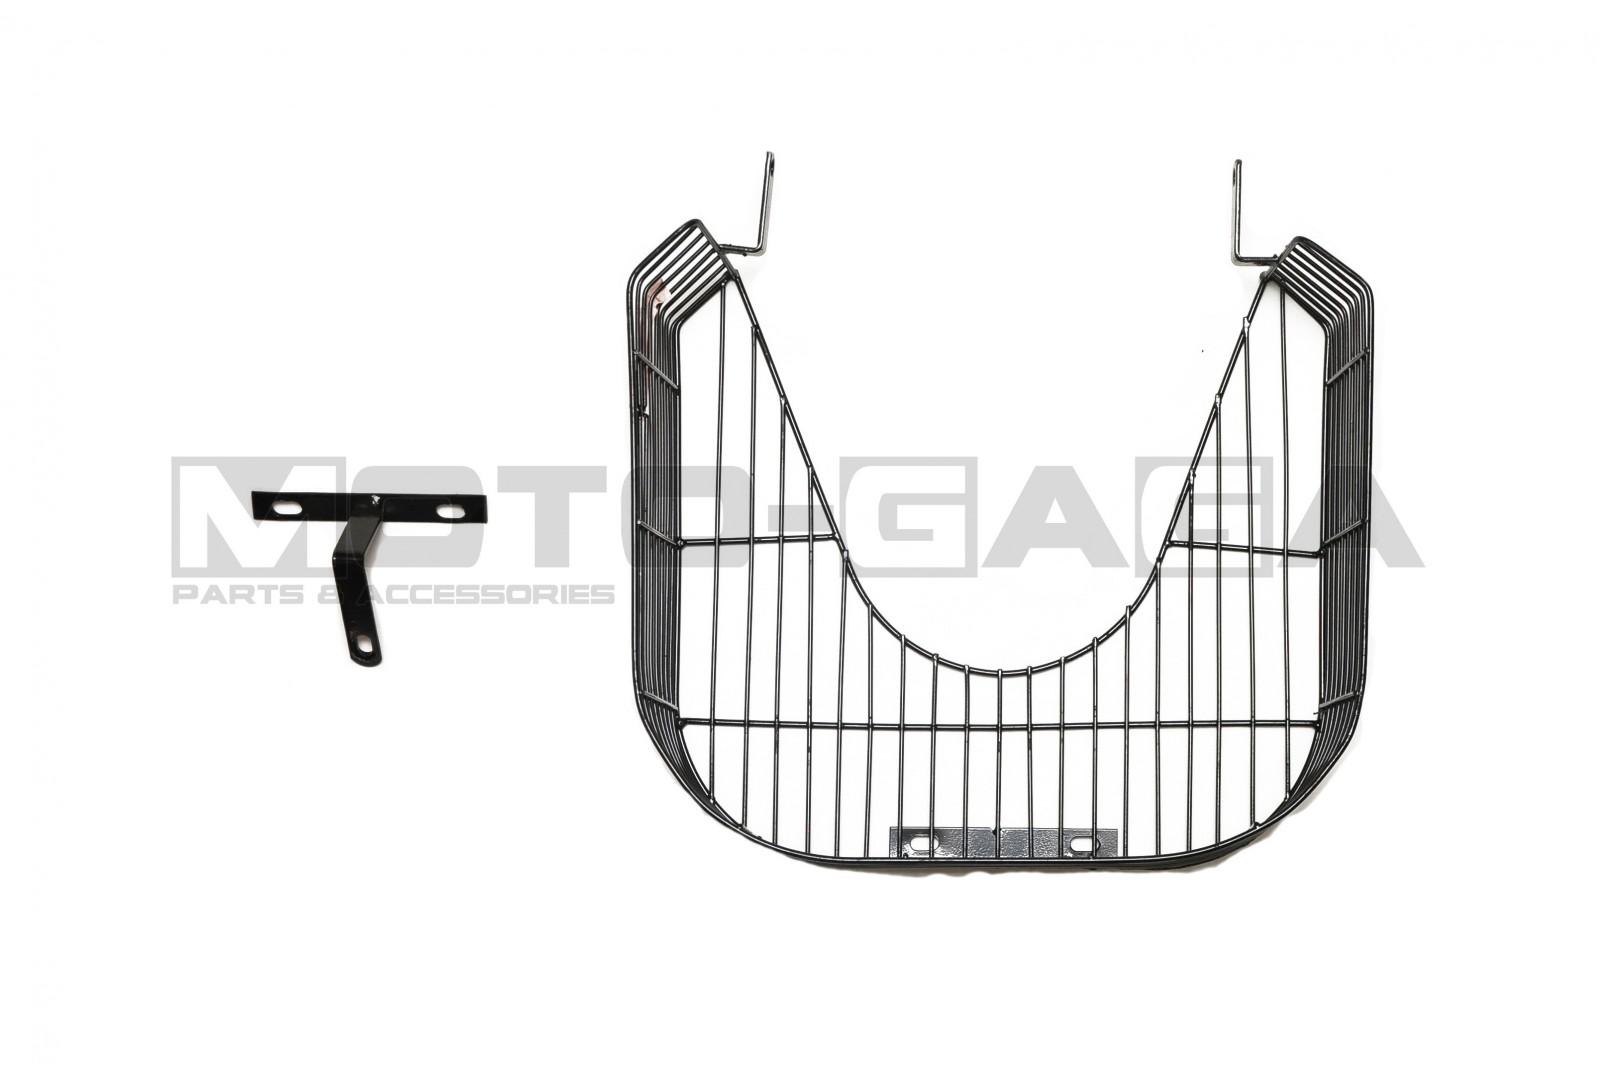 Yamaha T135 Jupiter Mx Crypton X Spark Exciter Sniper 135 V1 Metal Leg Shield Luggage Basket